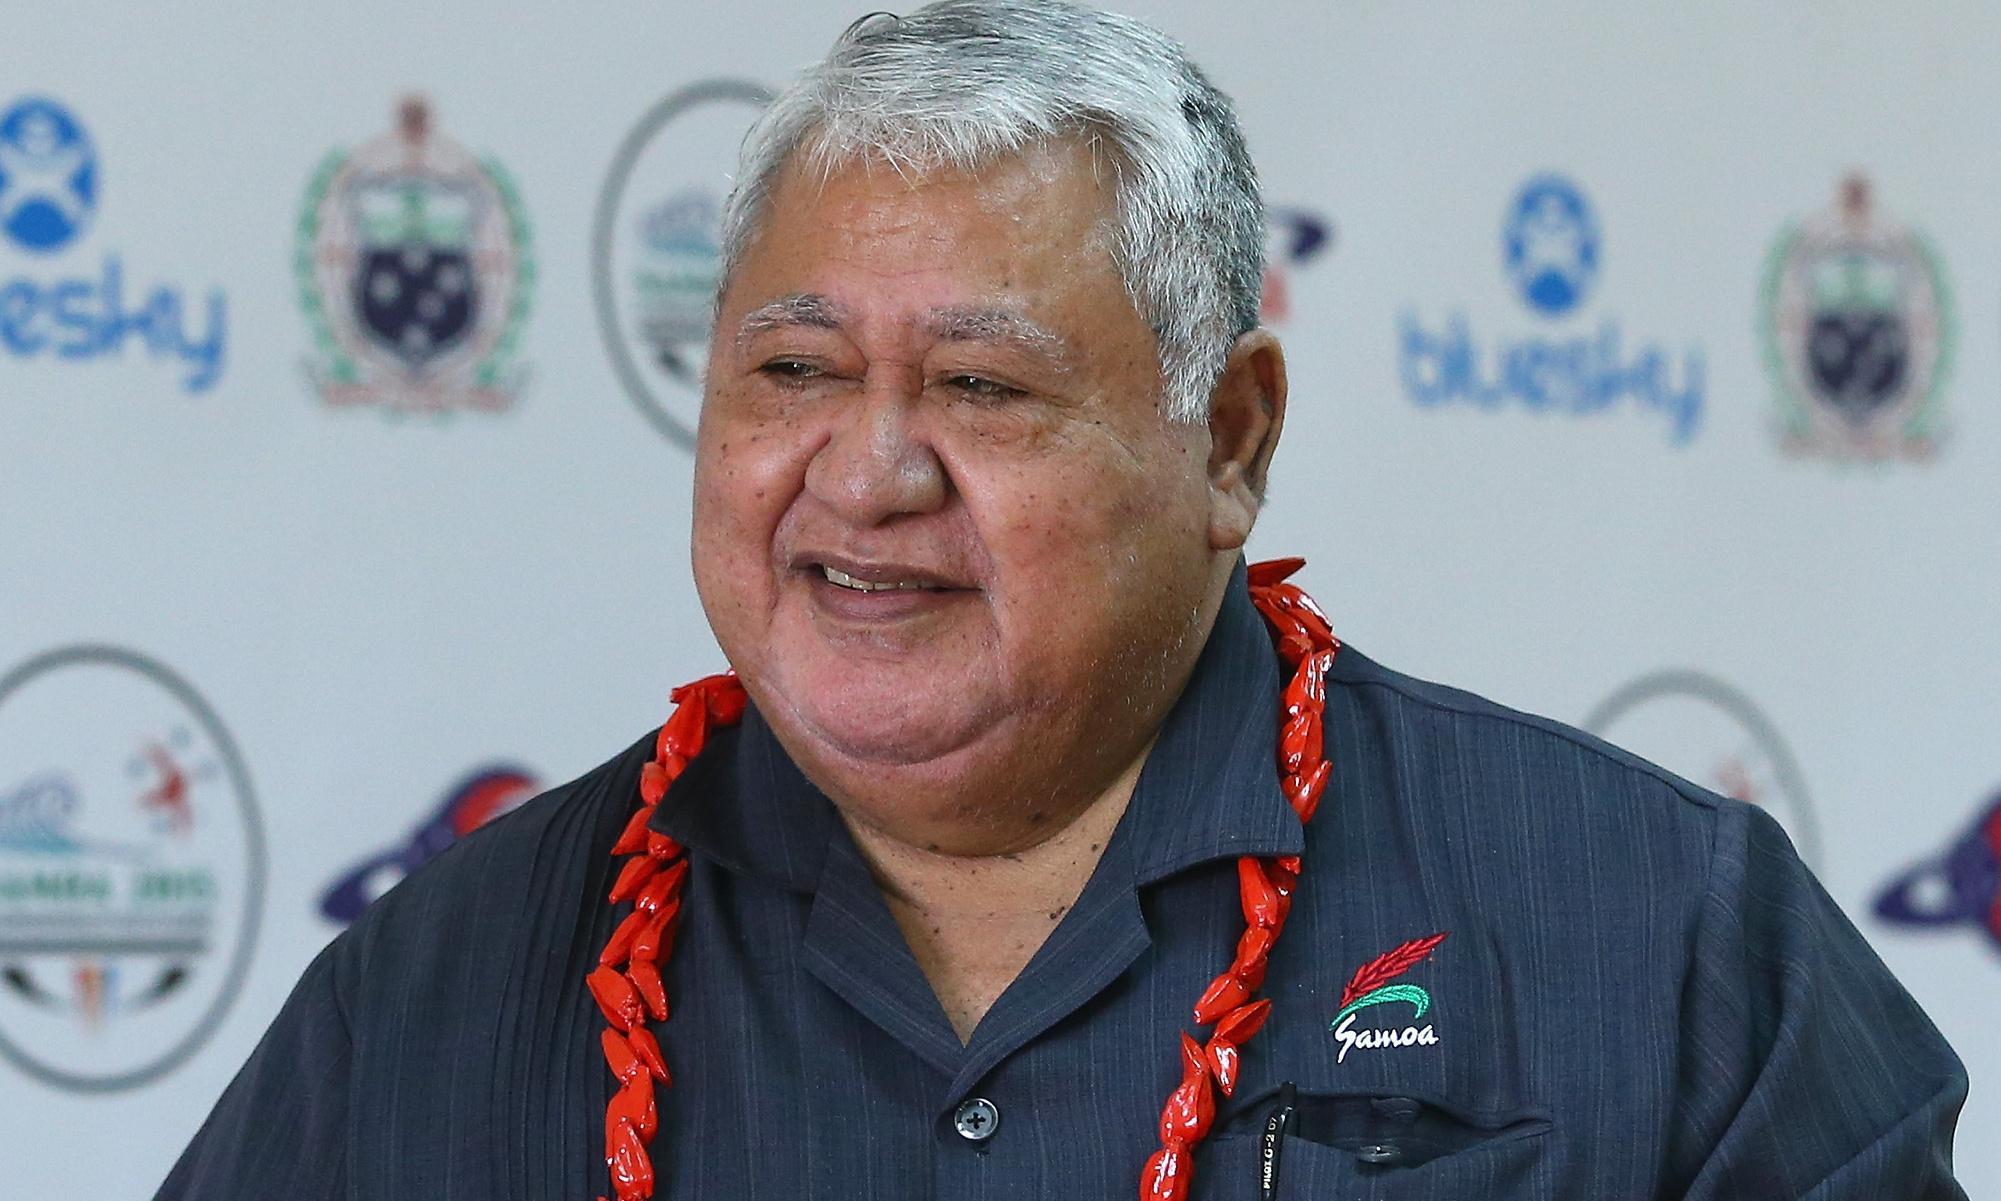 'Fingers crossed': Samoa PM hopes Australians will vote for climate action